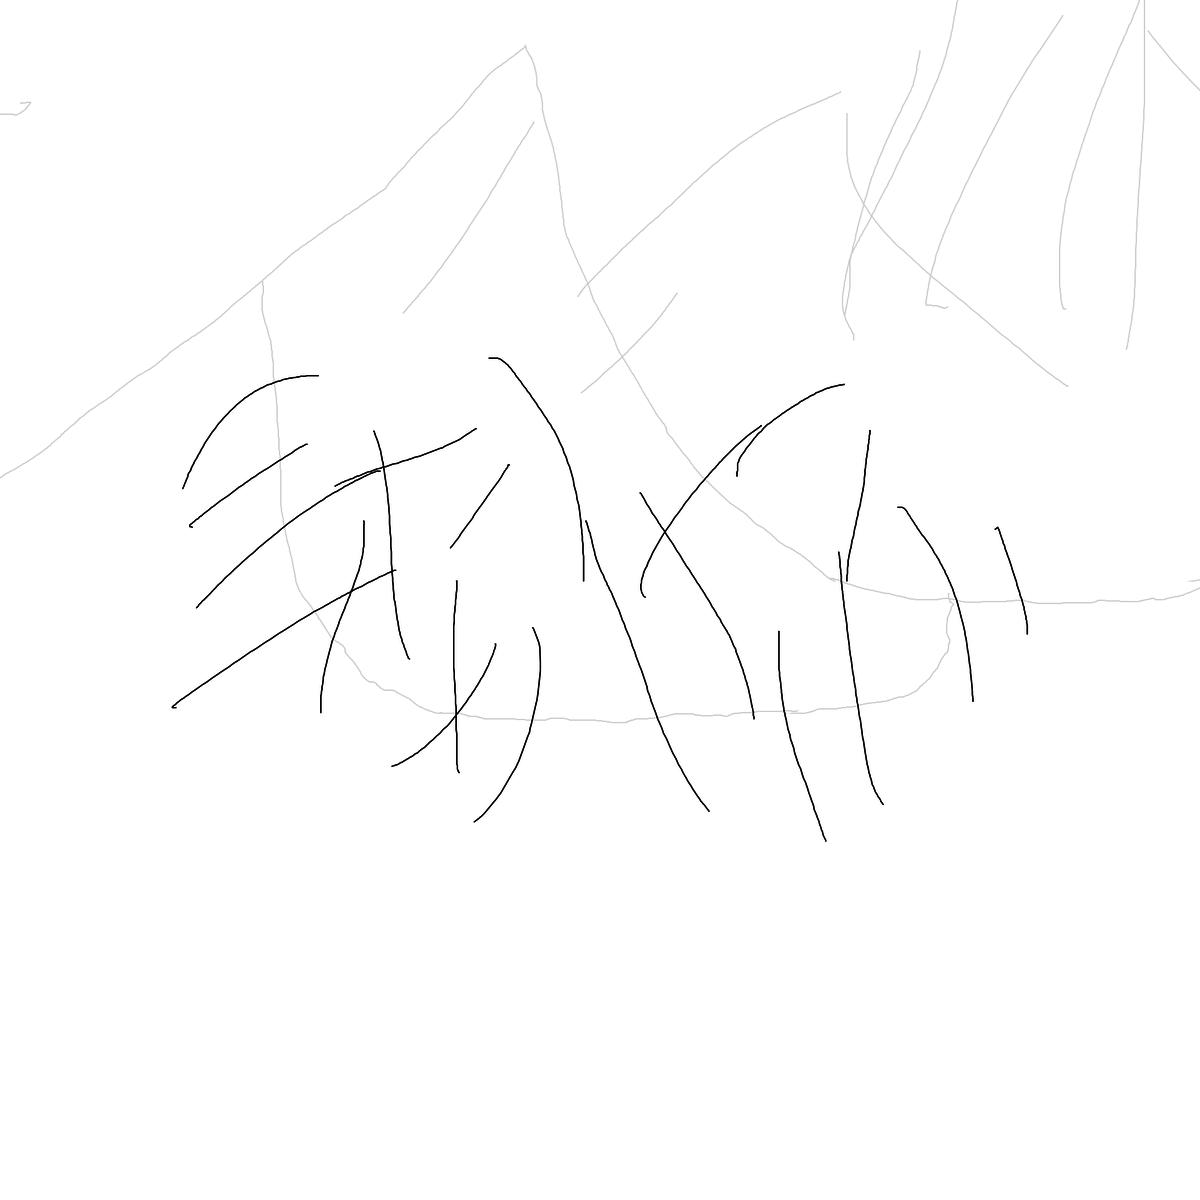 BAAAM drawing#16085 lat:39.0971069335937500lng: -84.5064392089843800